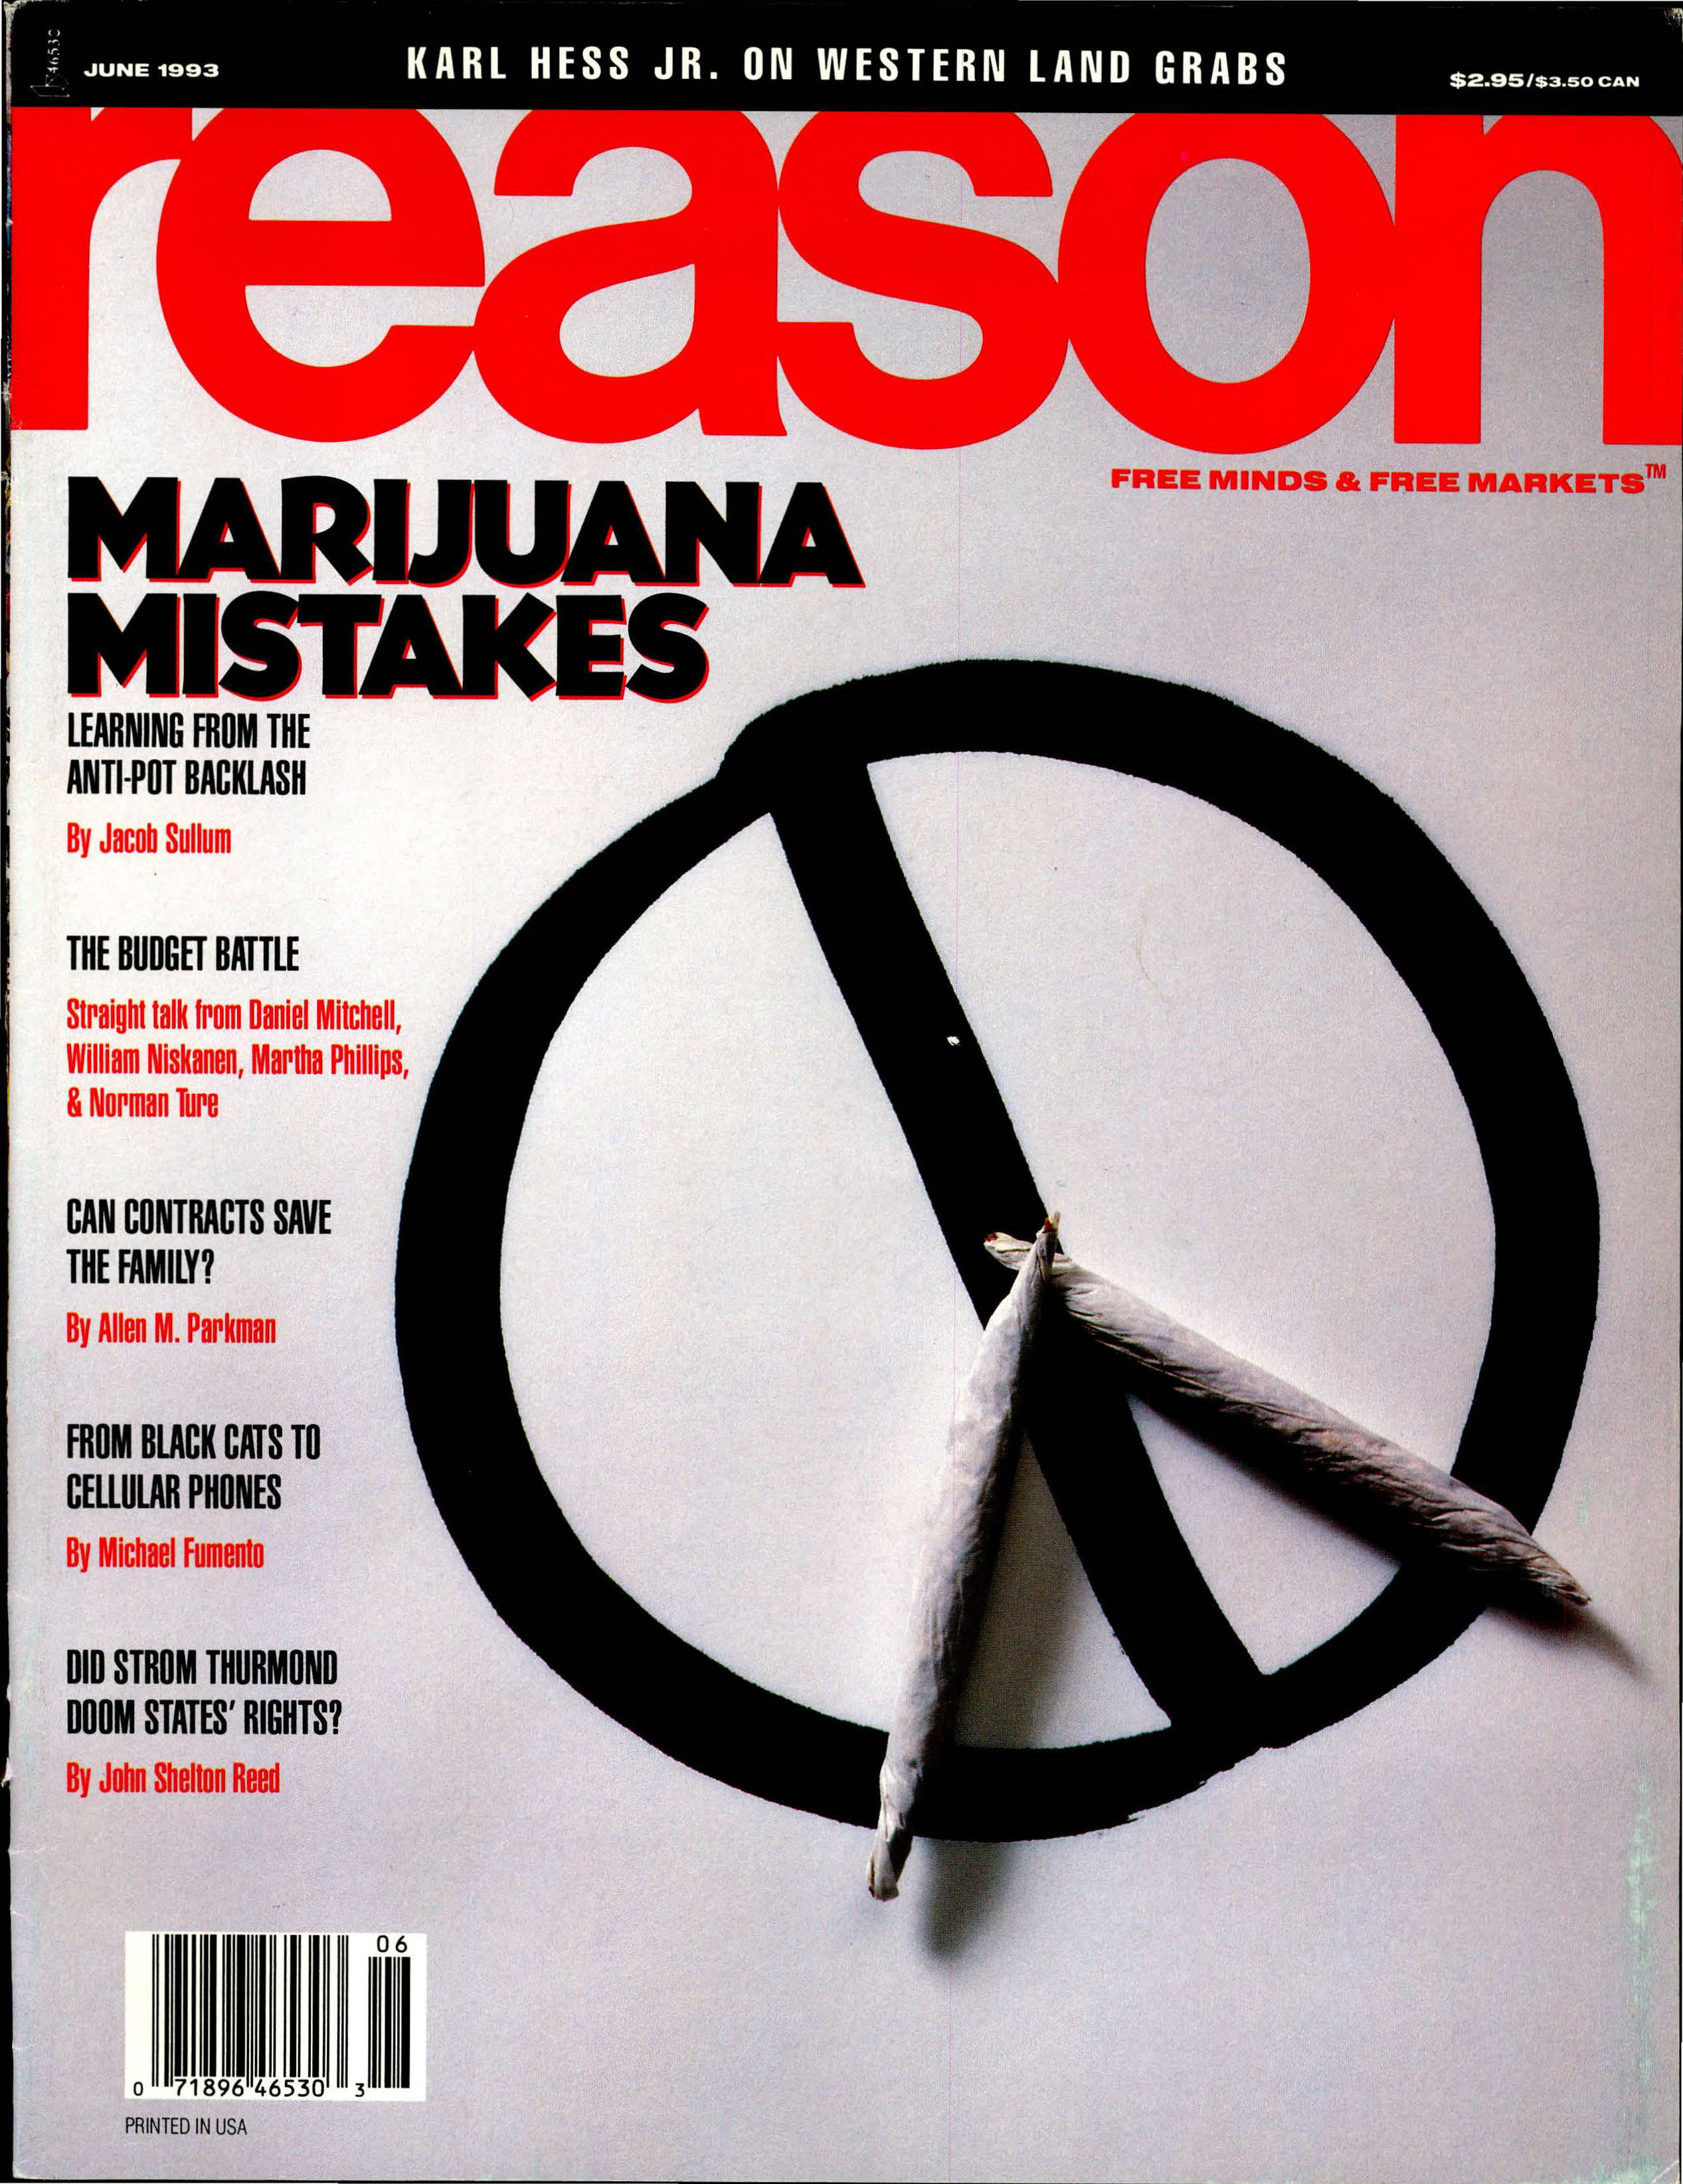 Reason Magazine, June 1993 cover image